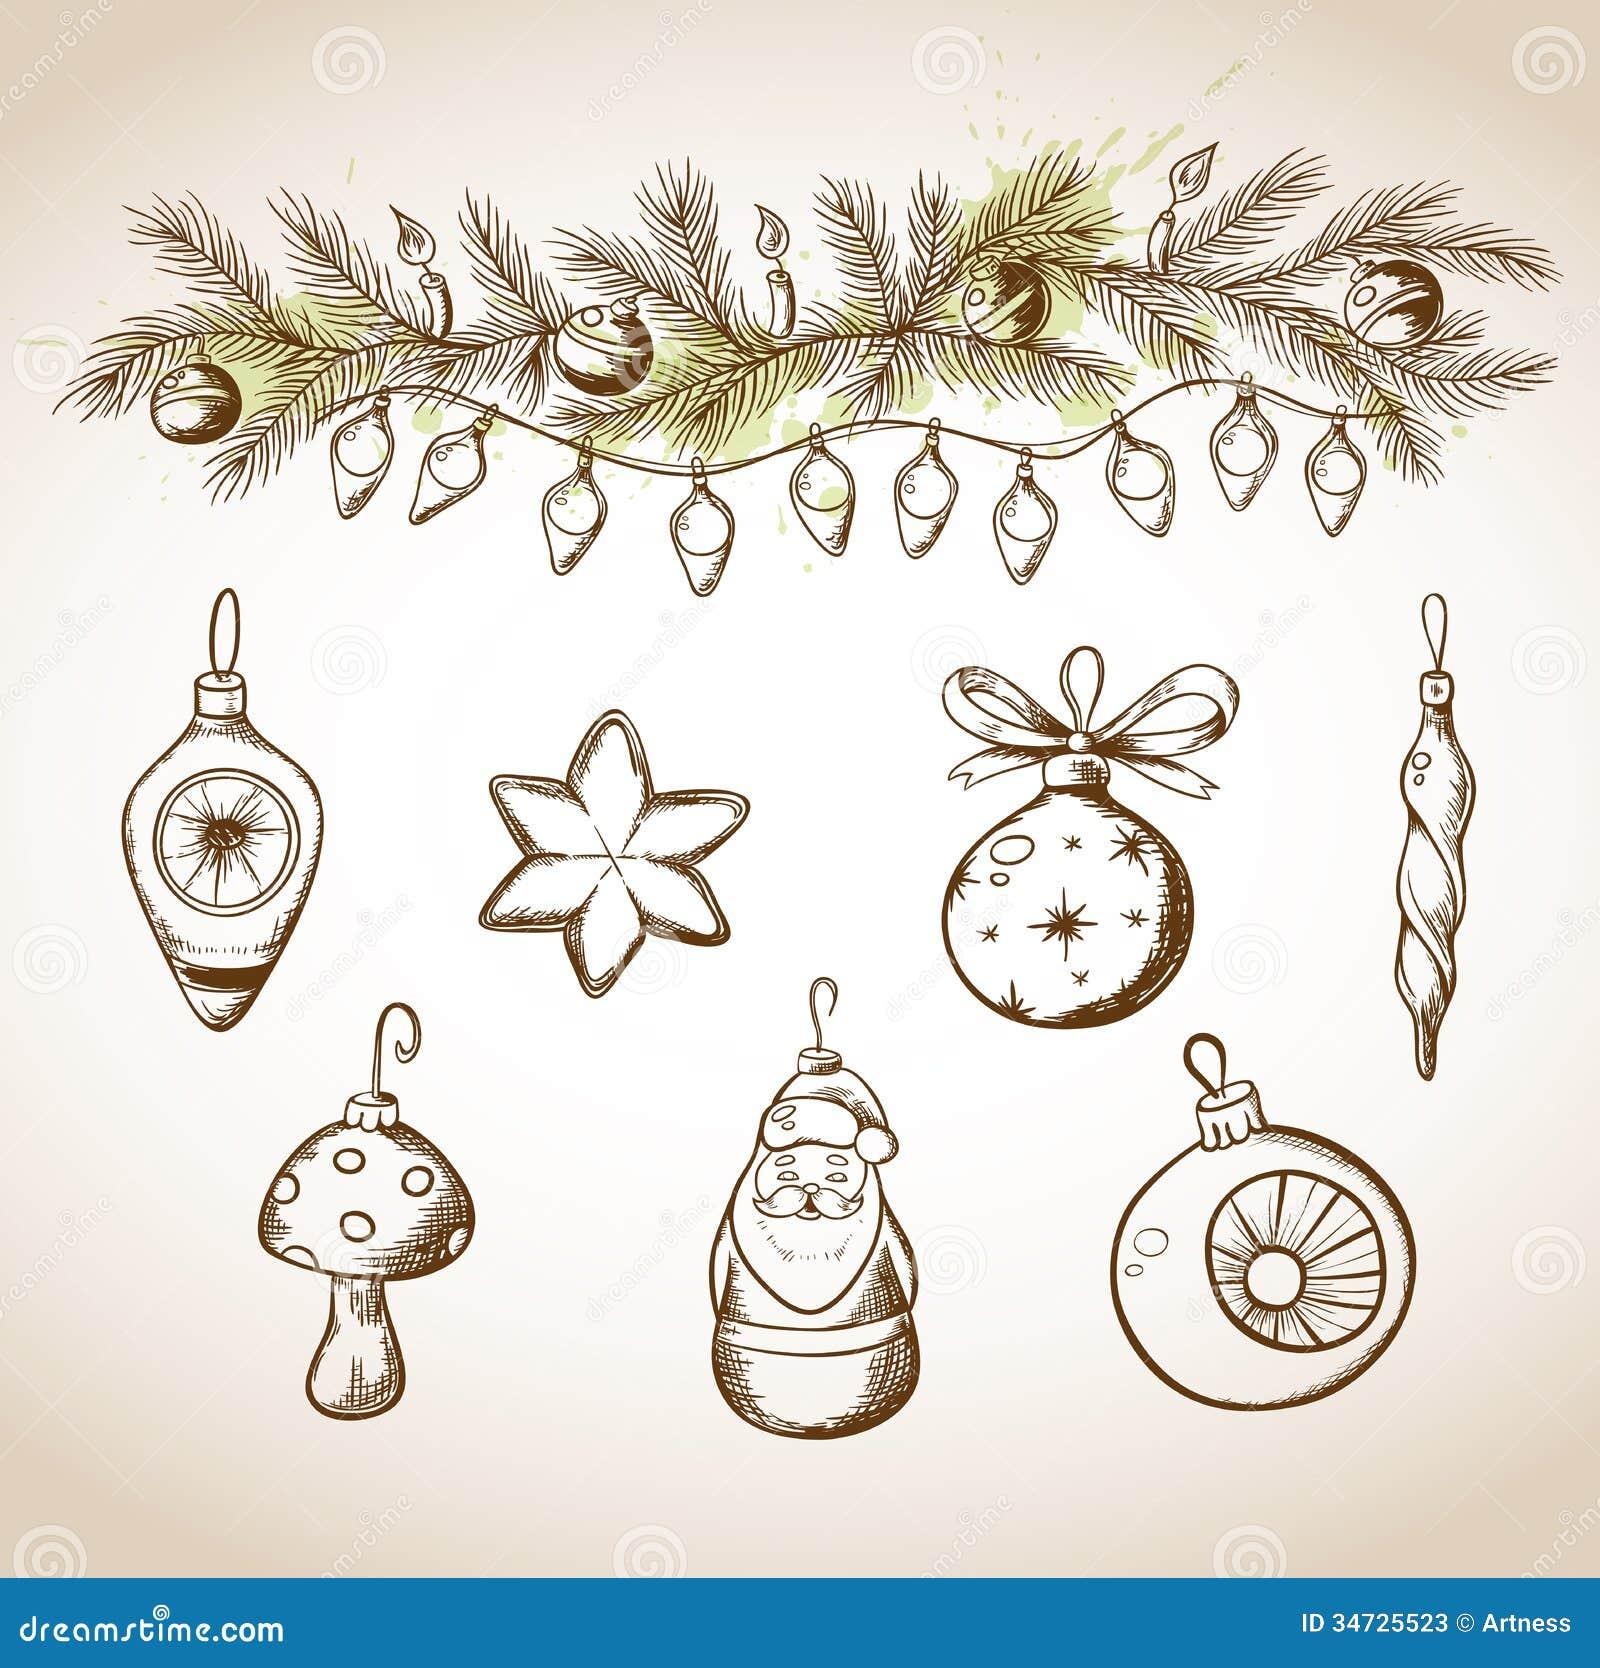 Hand Drawn Christmas Decorations Stock Photos - Image: 34725523